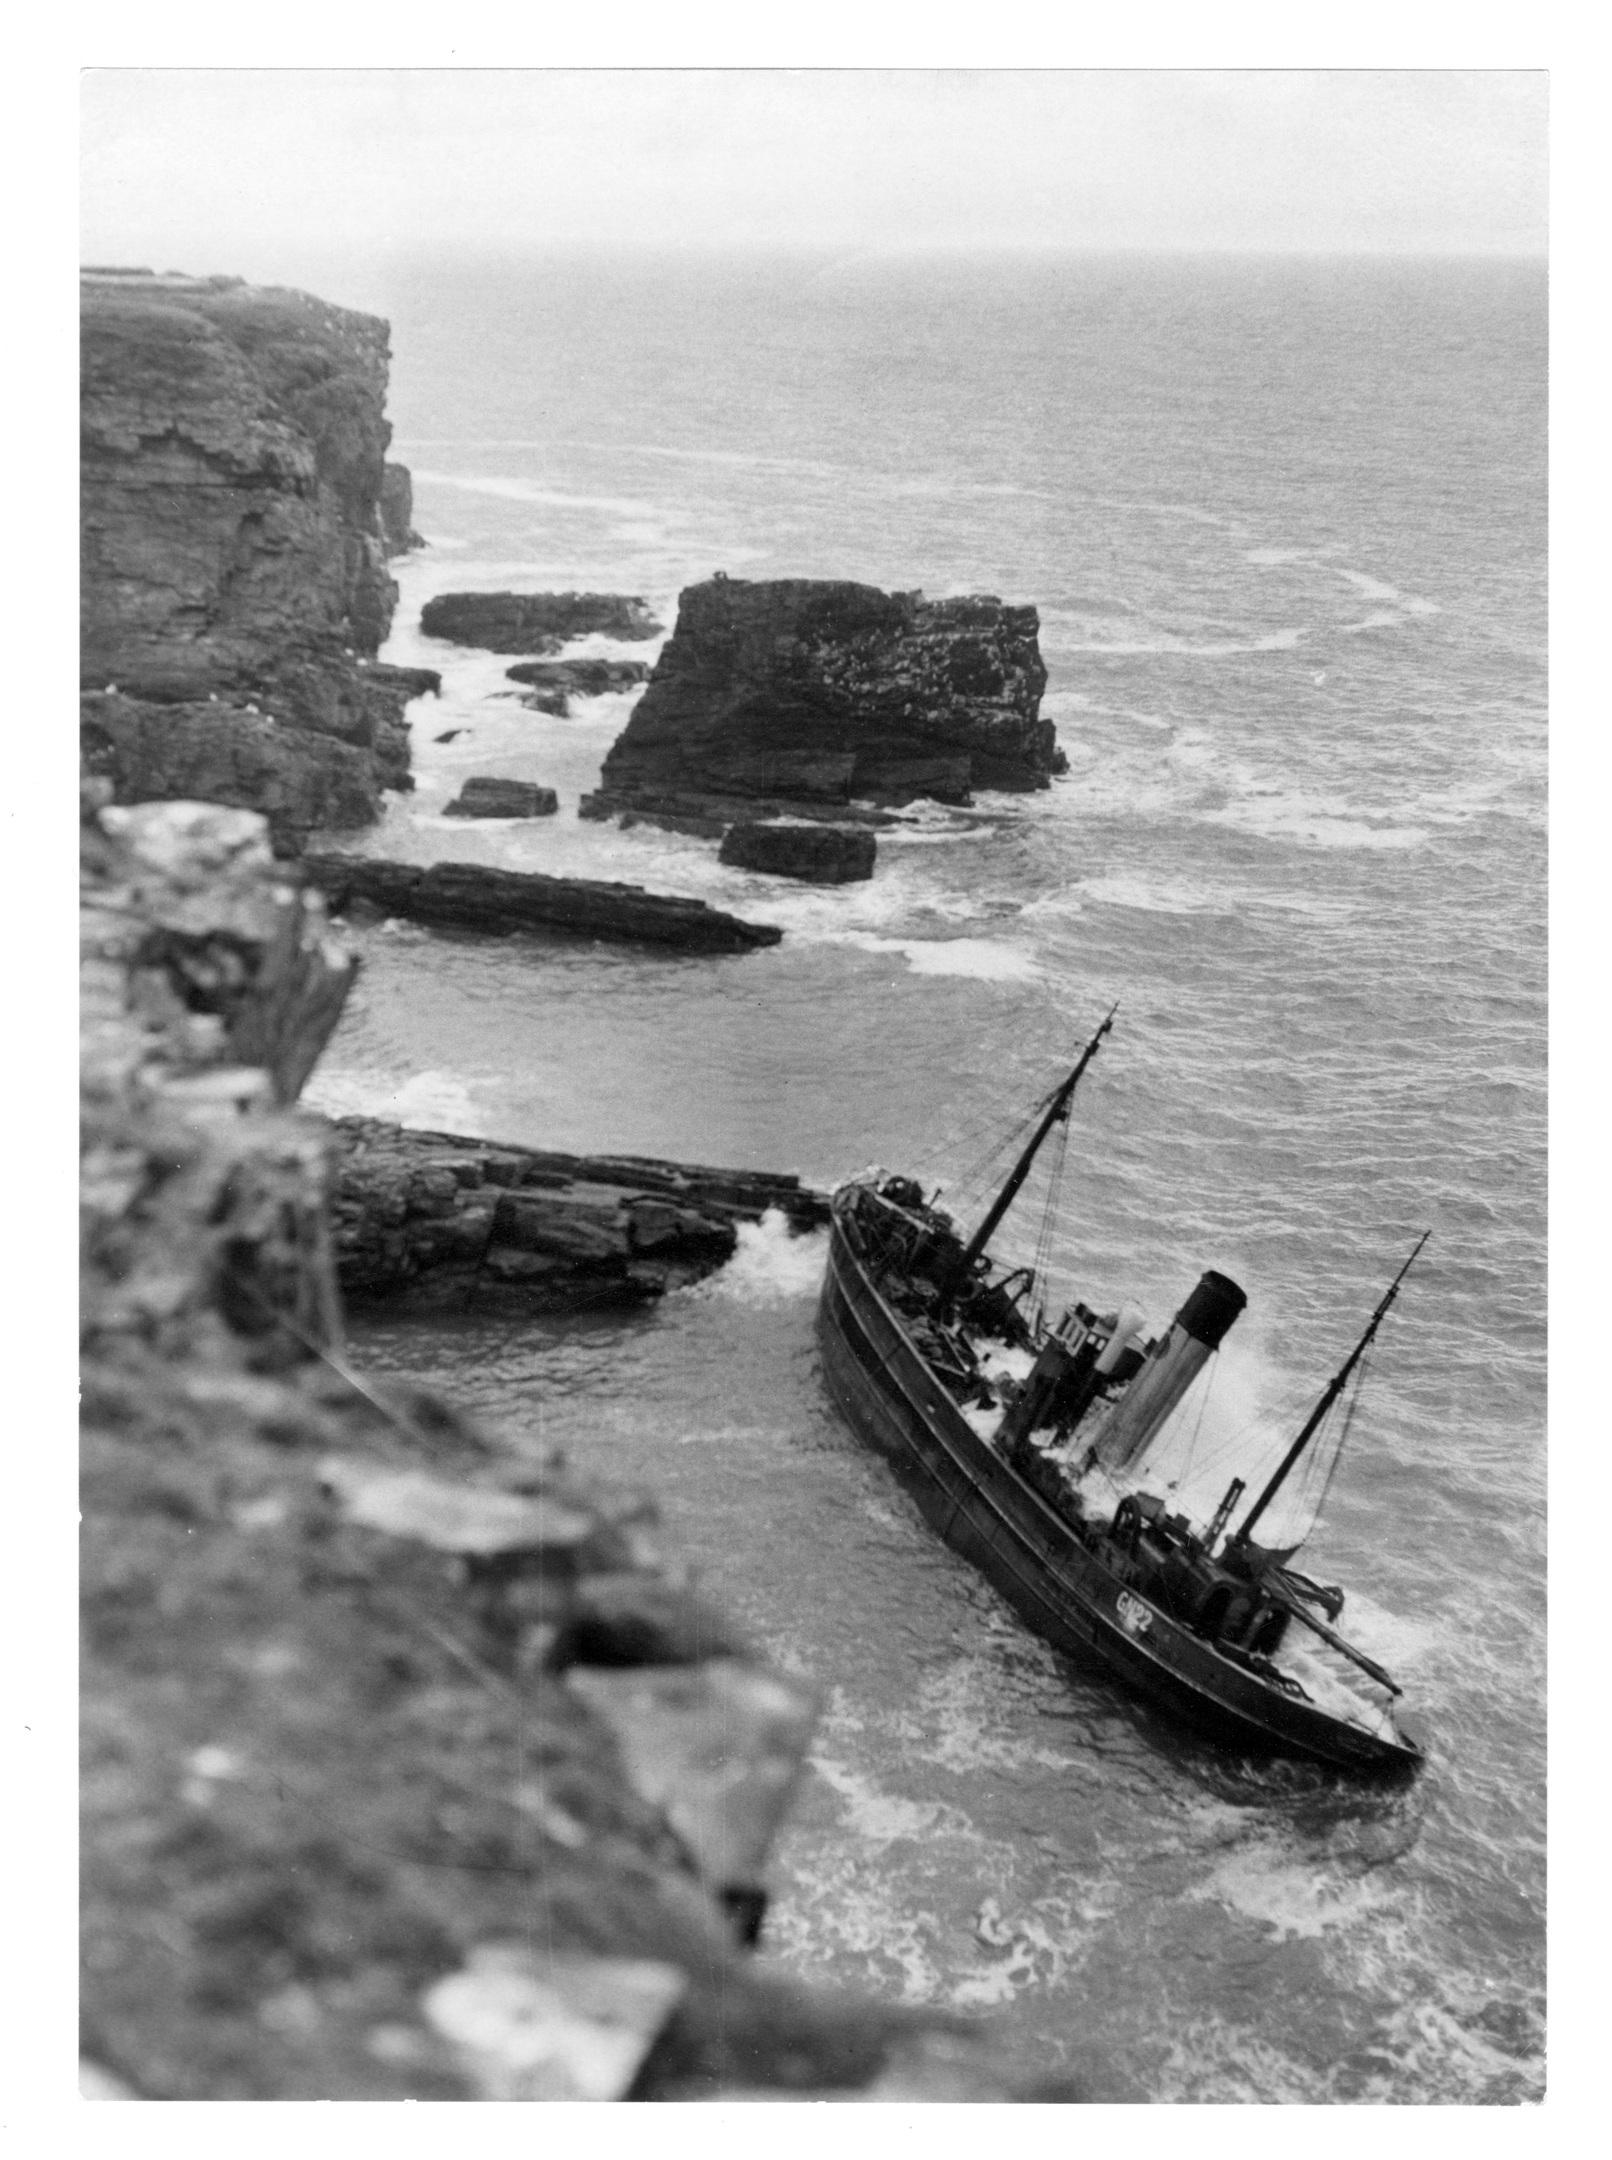 The Granton trawler, Contender, on the rocks near Cruden Bay.